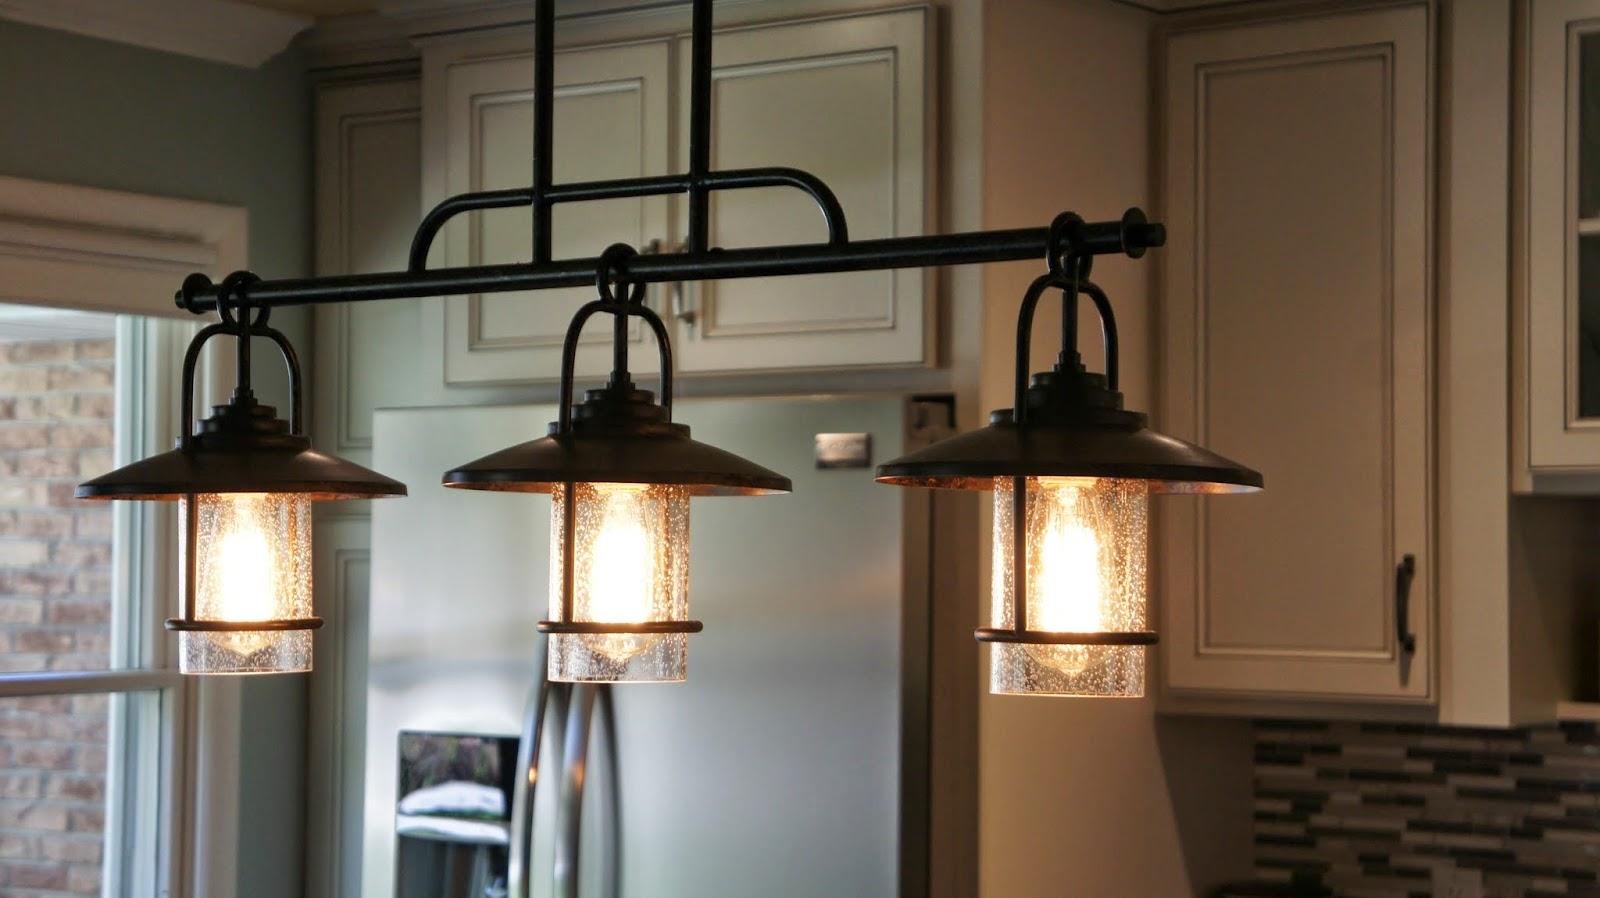 Kitchen Island Light Fixture Triple Bowl Sink Fixtures Pendant Over